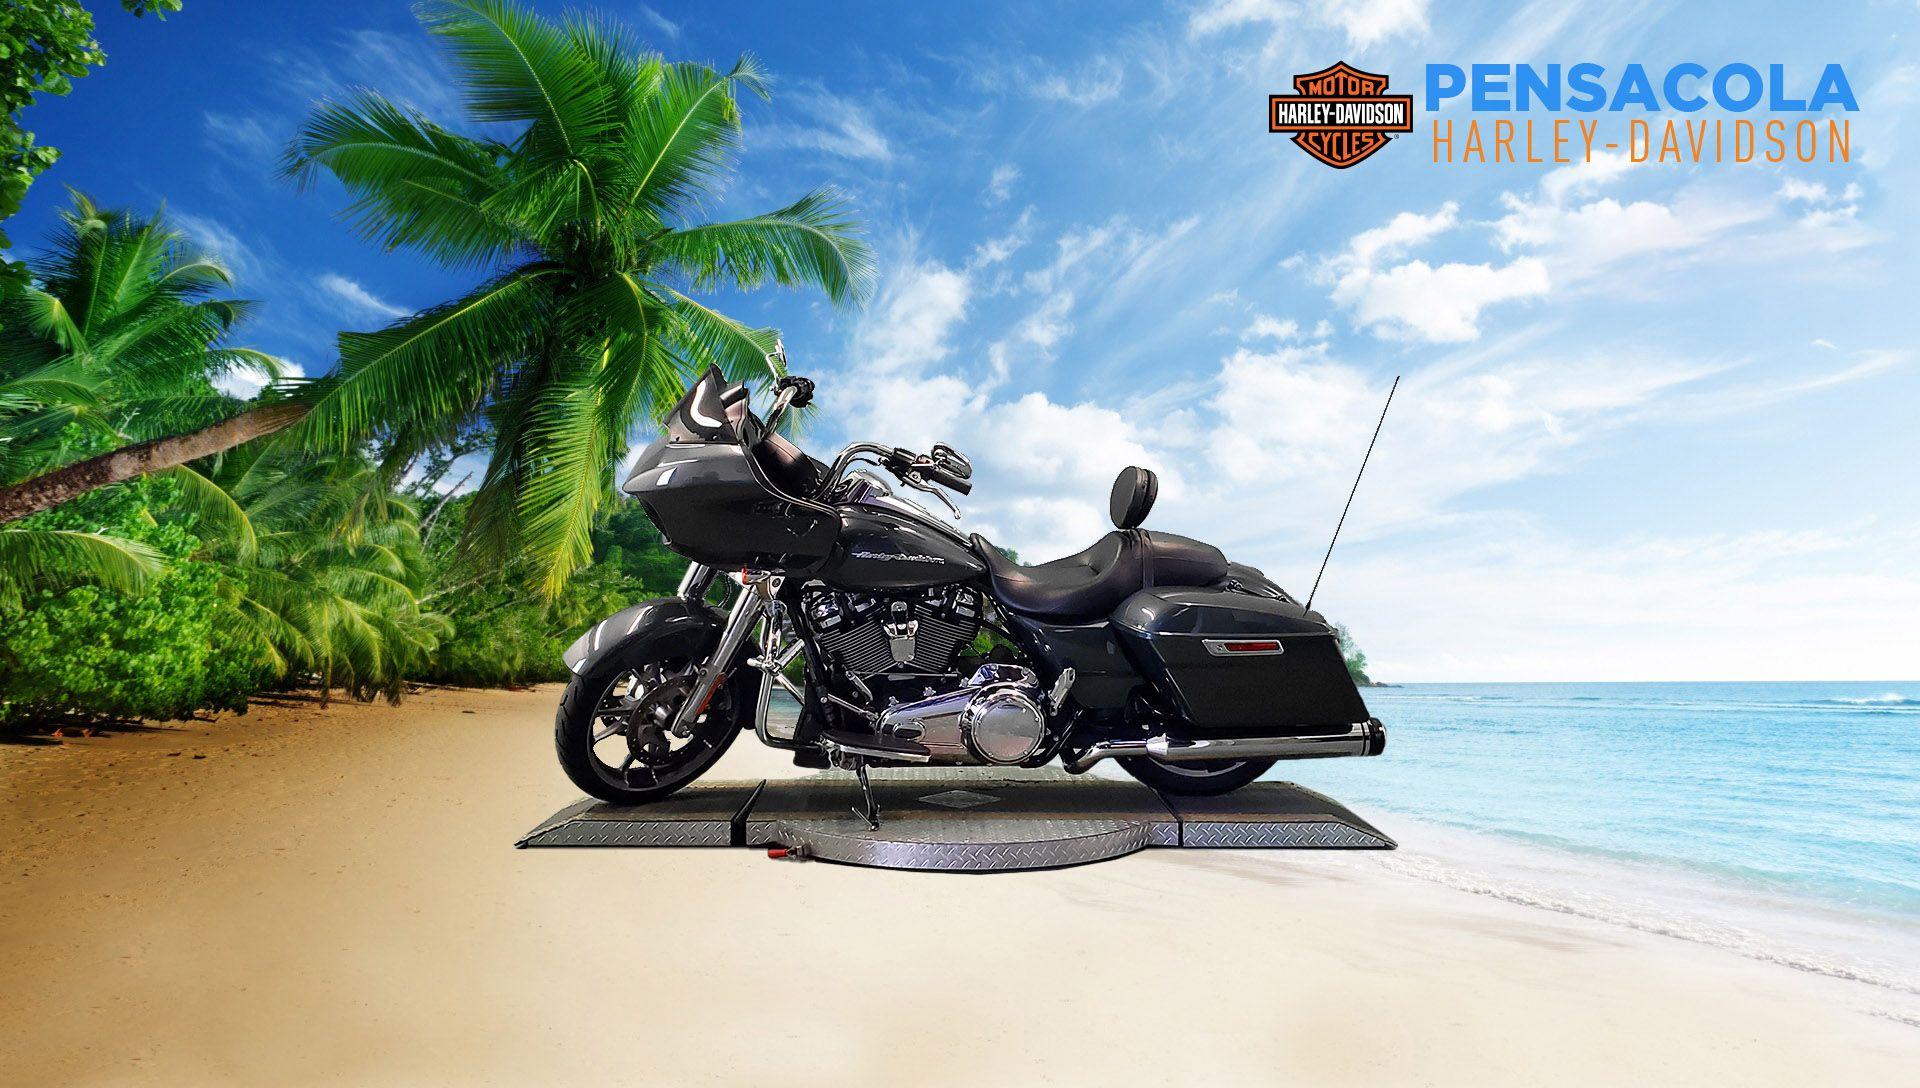 Certified Pre-Owned 2020 Harley-Davidson Road Glide FLTRX